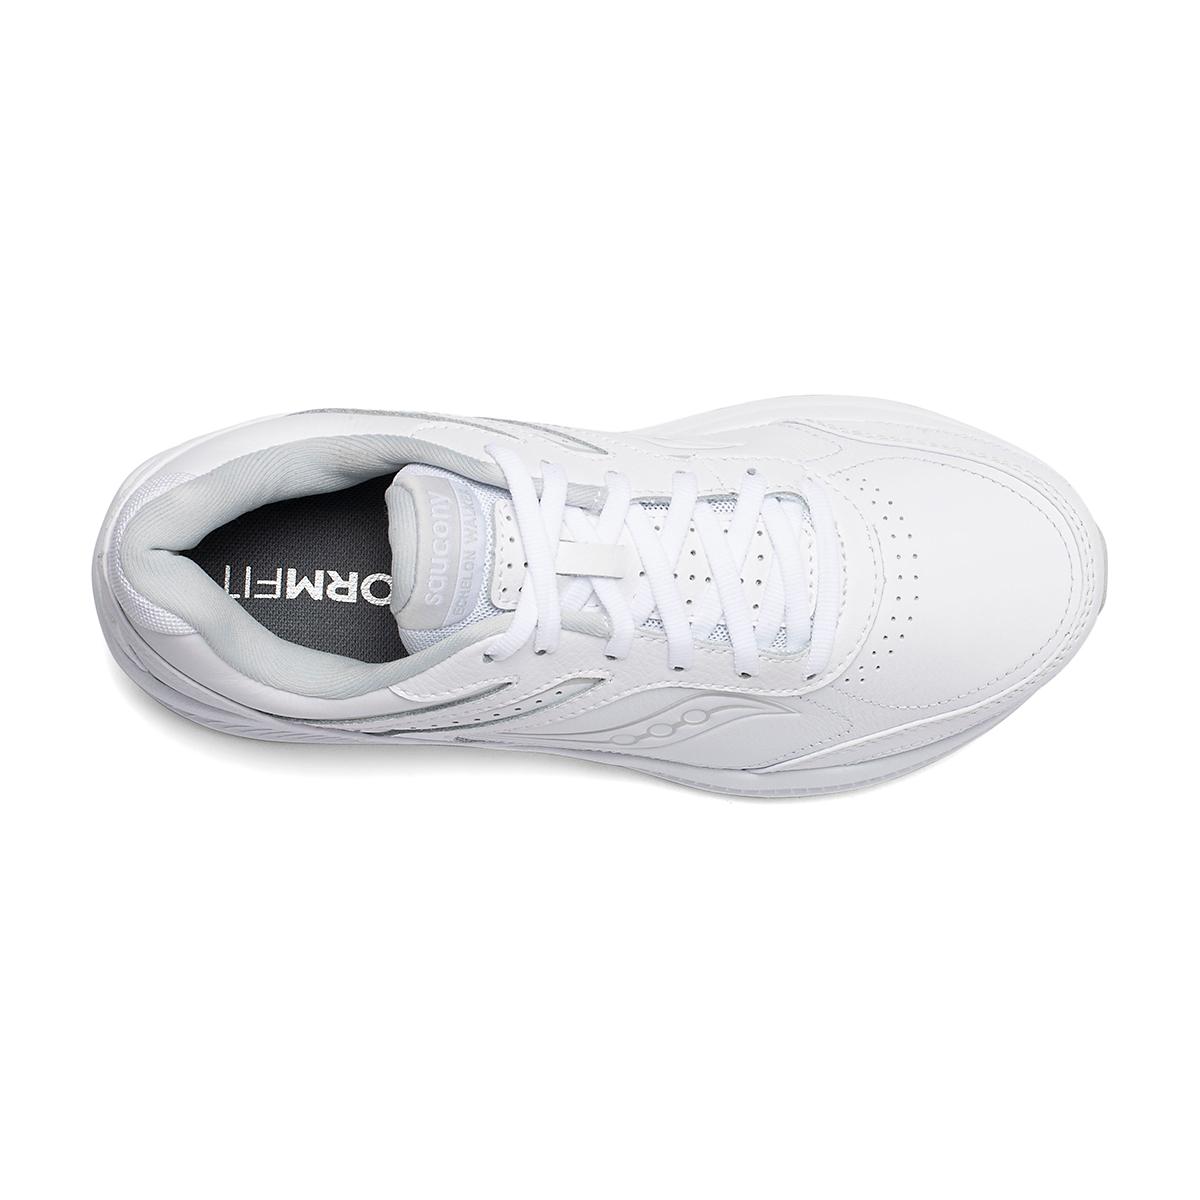 Women's Saucony Echelon Walker 3 Walking Shoe - Color: White - Size: 5 - Width: Regular, White, large, image 3